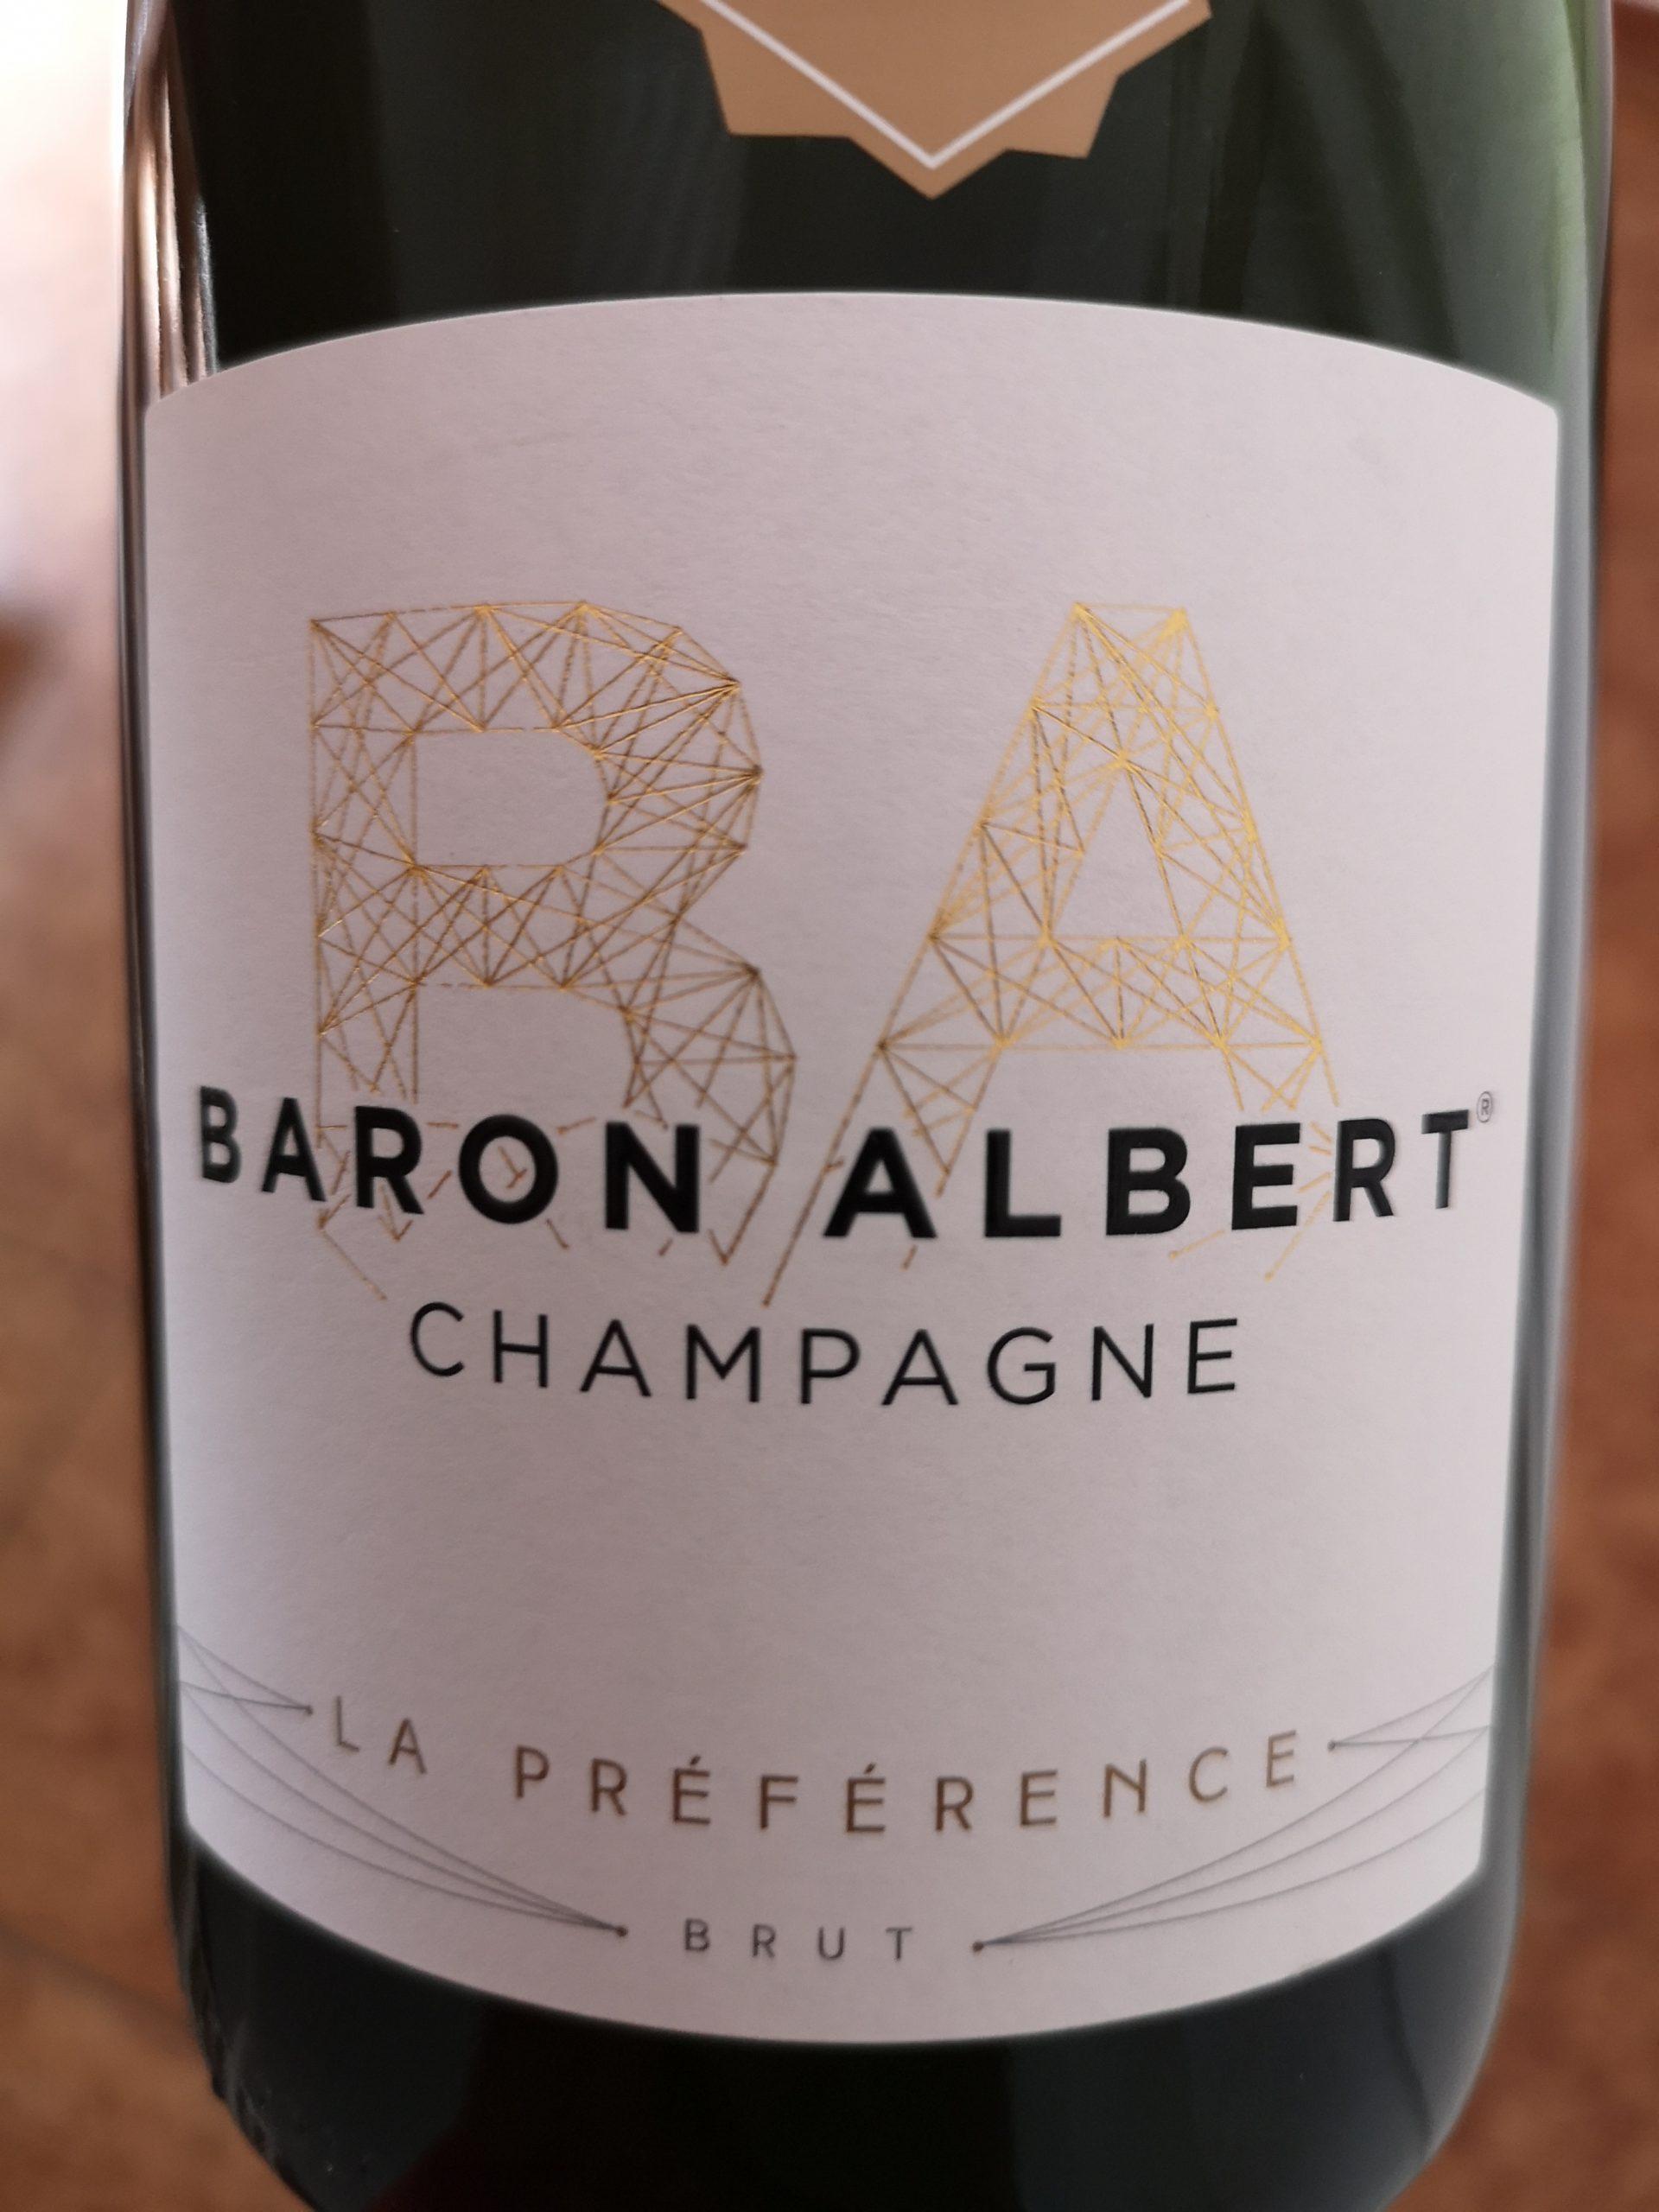 2013 Champagne Brut La Préférence | Baron Albert